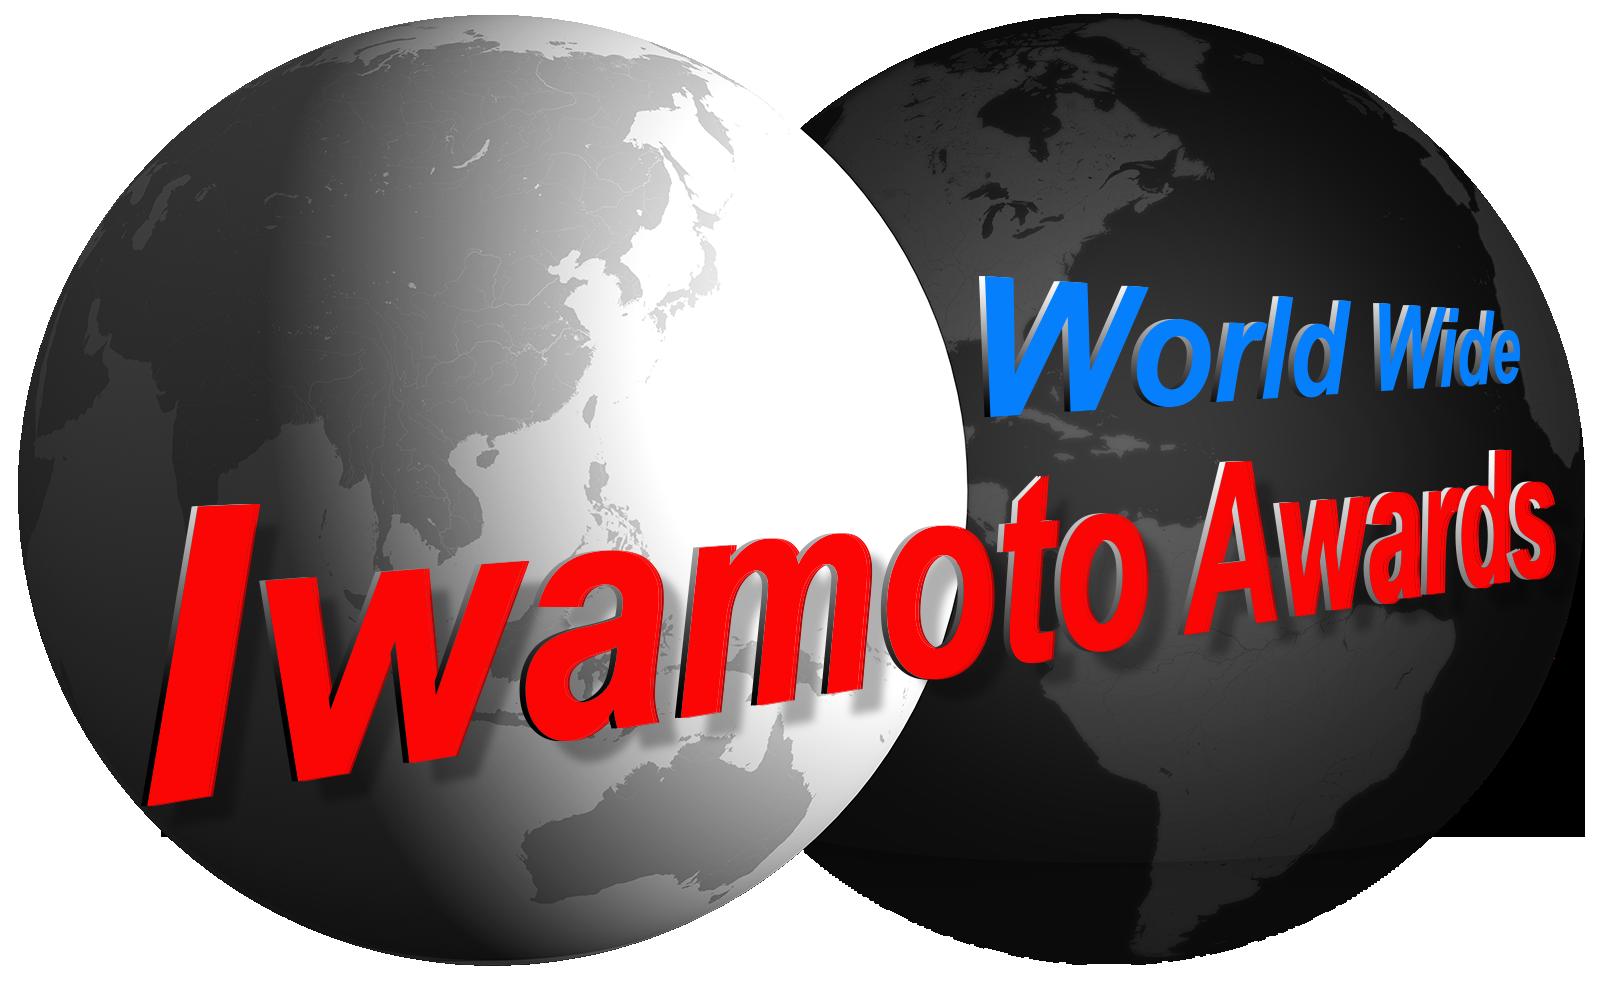 http://eurogotv.com/images/iwamoto-st.png